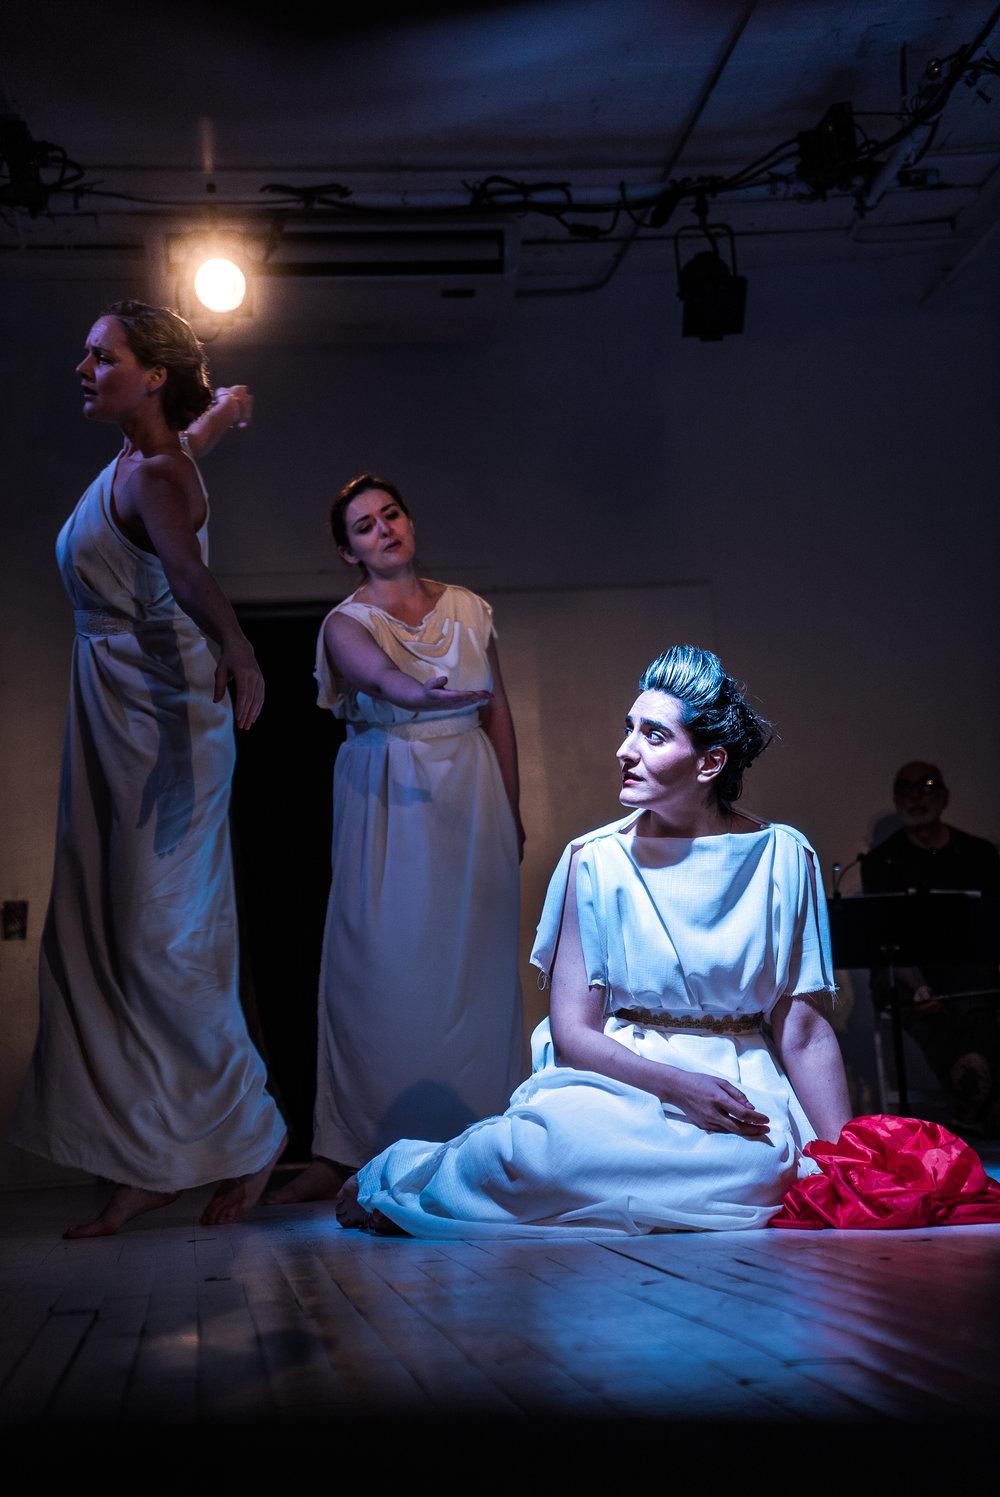 Aumna Iqbal as Orfeo, with Elyse Anne Kakacek and Laura Mitchell in Euridice. Photo credit: Lucas Godlewski